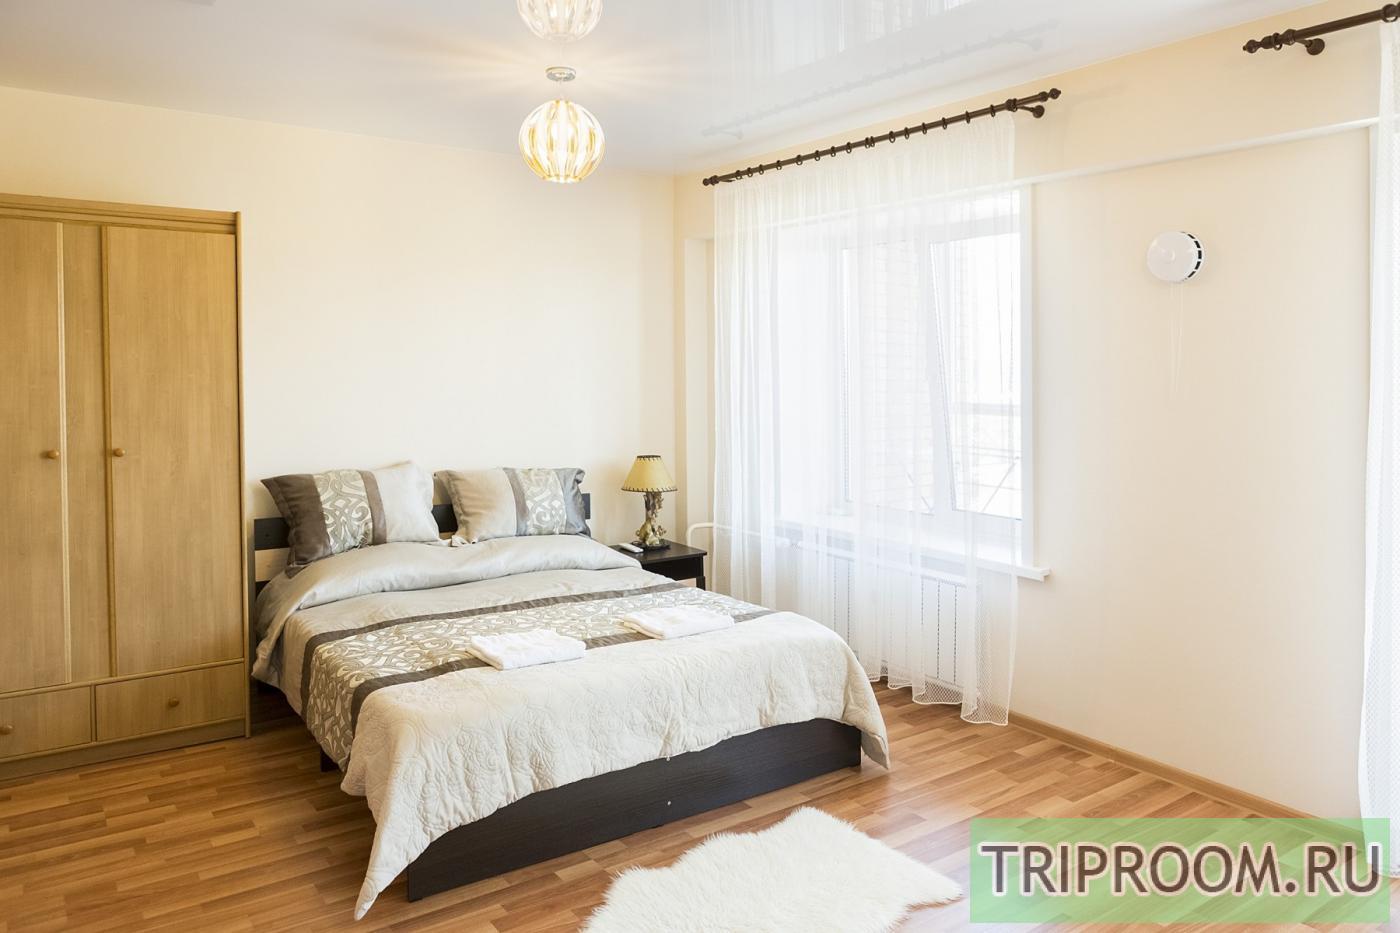 1-комнатная квартира посуточно (вариант № 35709), ул. Ядринцева улица, фото № 5